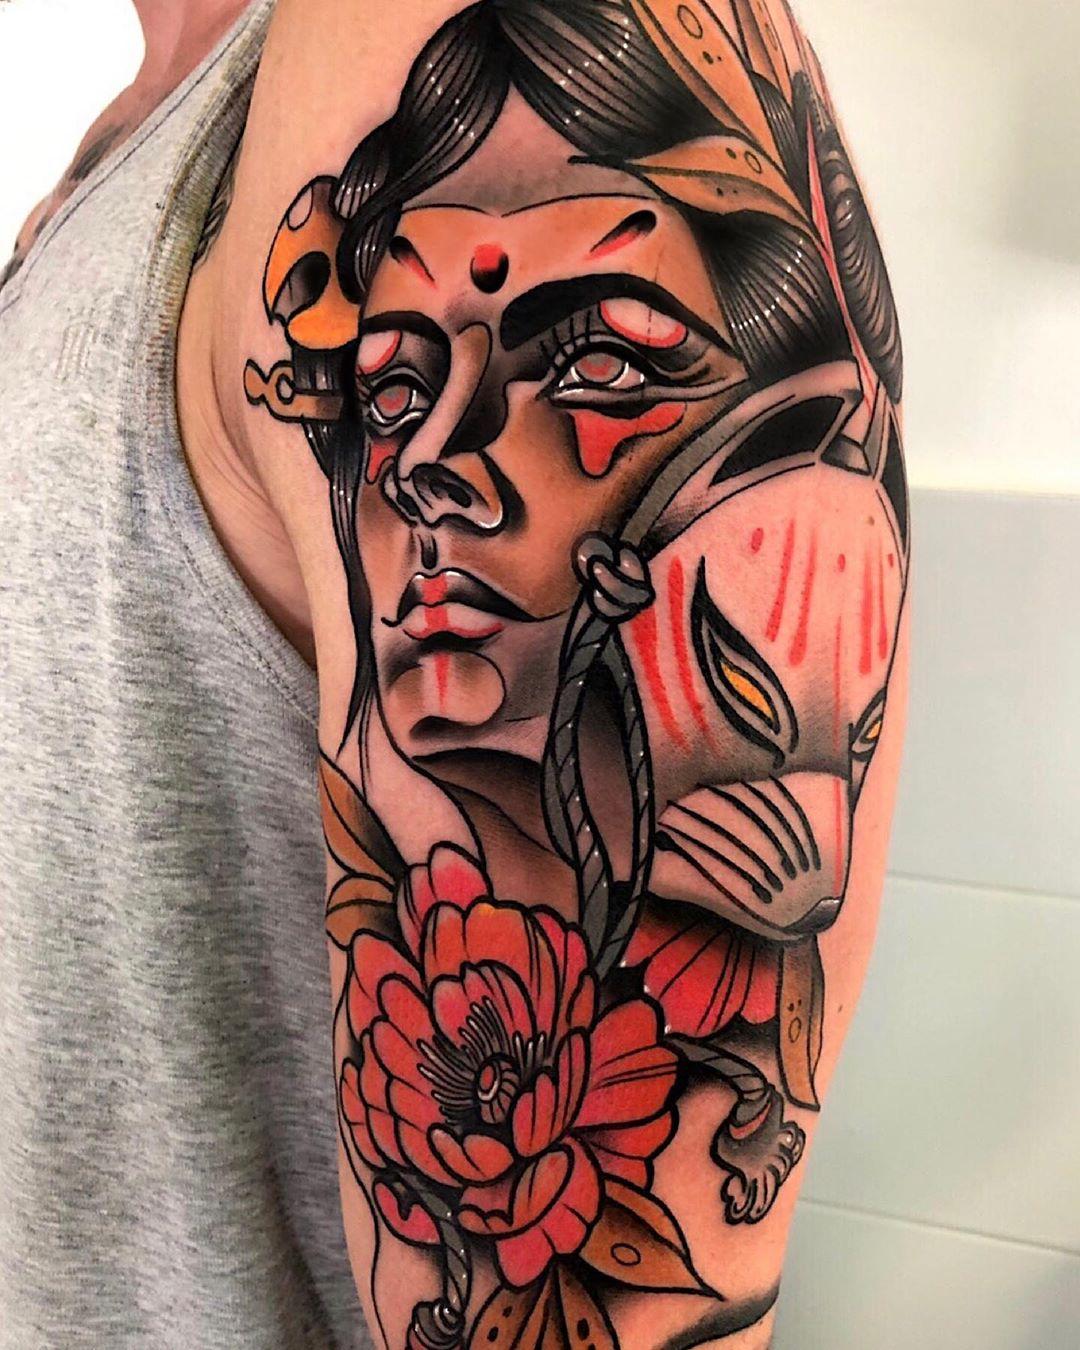 neotradicionaltattoo,followforfollow,berlin,followmeciudadreal,ciudadreal,tomelloso,almagro,puertollano,tatuajesenpuertollano,tatuajesendaimiel,ciudadrealtattoo,ciudadrealtatuajes,tatuajesciudadreal,follow,ciudadrealtatuajes,puertollano,tattooers,besttattooers,juantabasco,ciudadrealsetatua,ink,tatuajes,realismo,realistictattoo,ciudadrealtattoo,tatuajesenpuertollano,traditionaltattoos,castillalamancha,ink,tattooart,zurichtattoo,daimiel,inkedgirls,inkig,ink,inktattoos